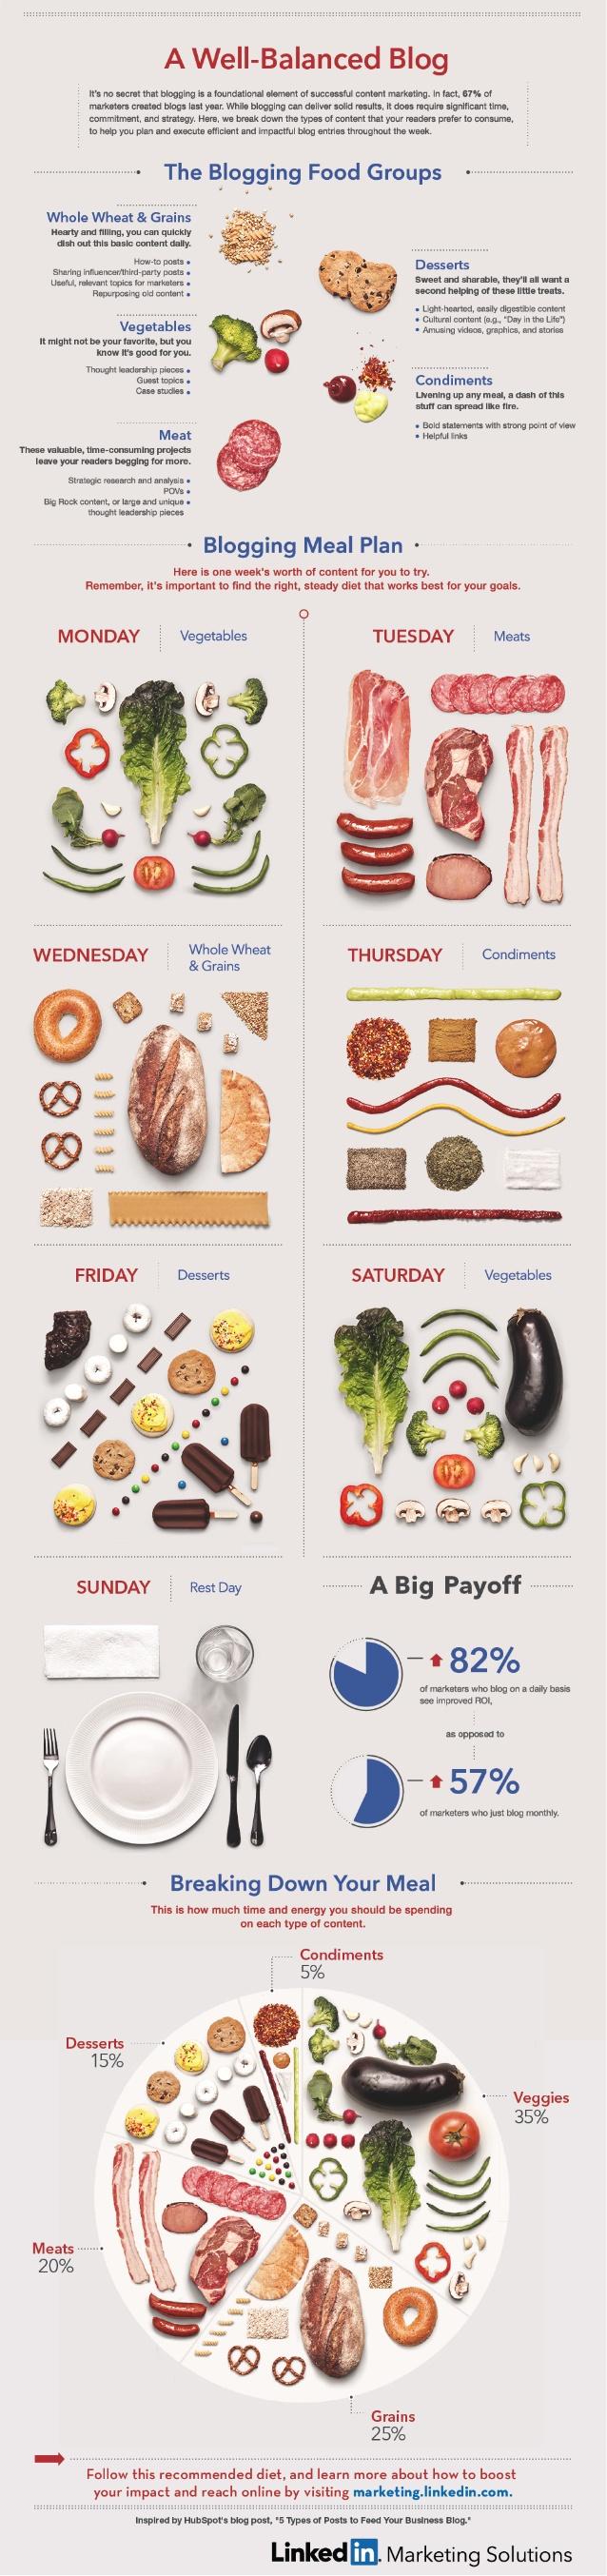 infographic-wellbalanced-blog